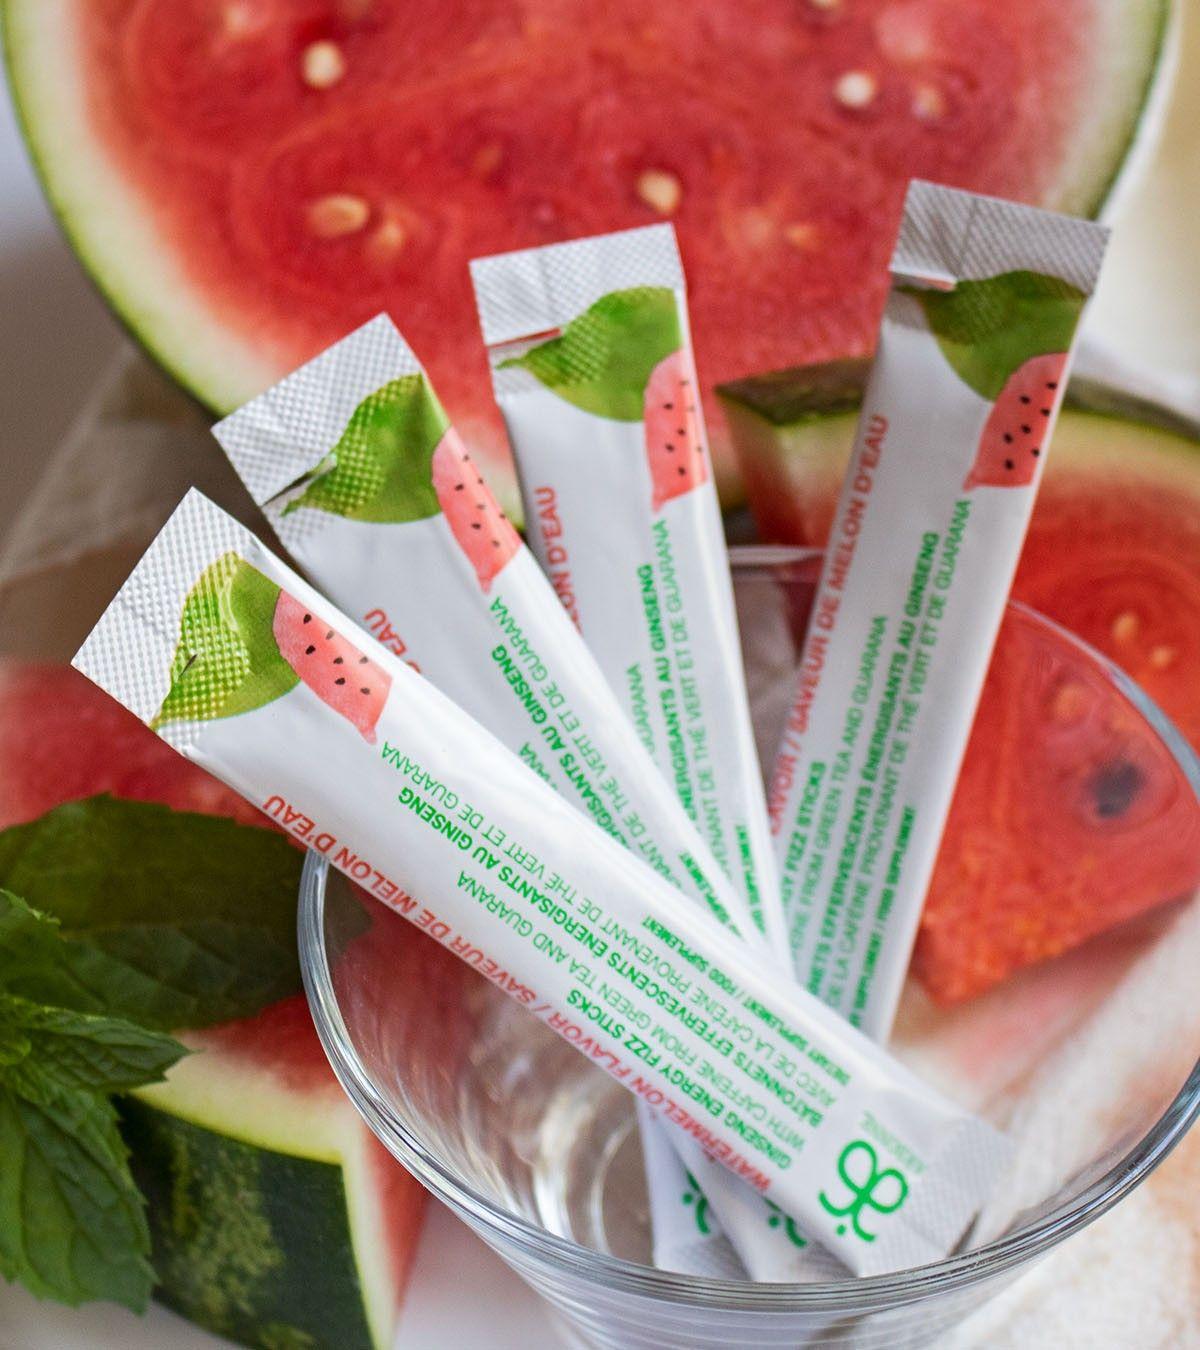 New Limited Edition Ginseng Energy Fizz Stick Watermelon Flavour In 2020 Fizz Fizz Sticks Arbonne Nutrition